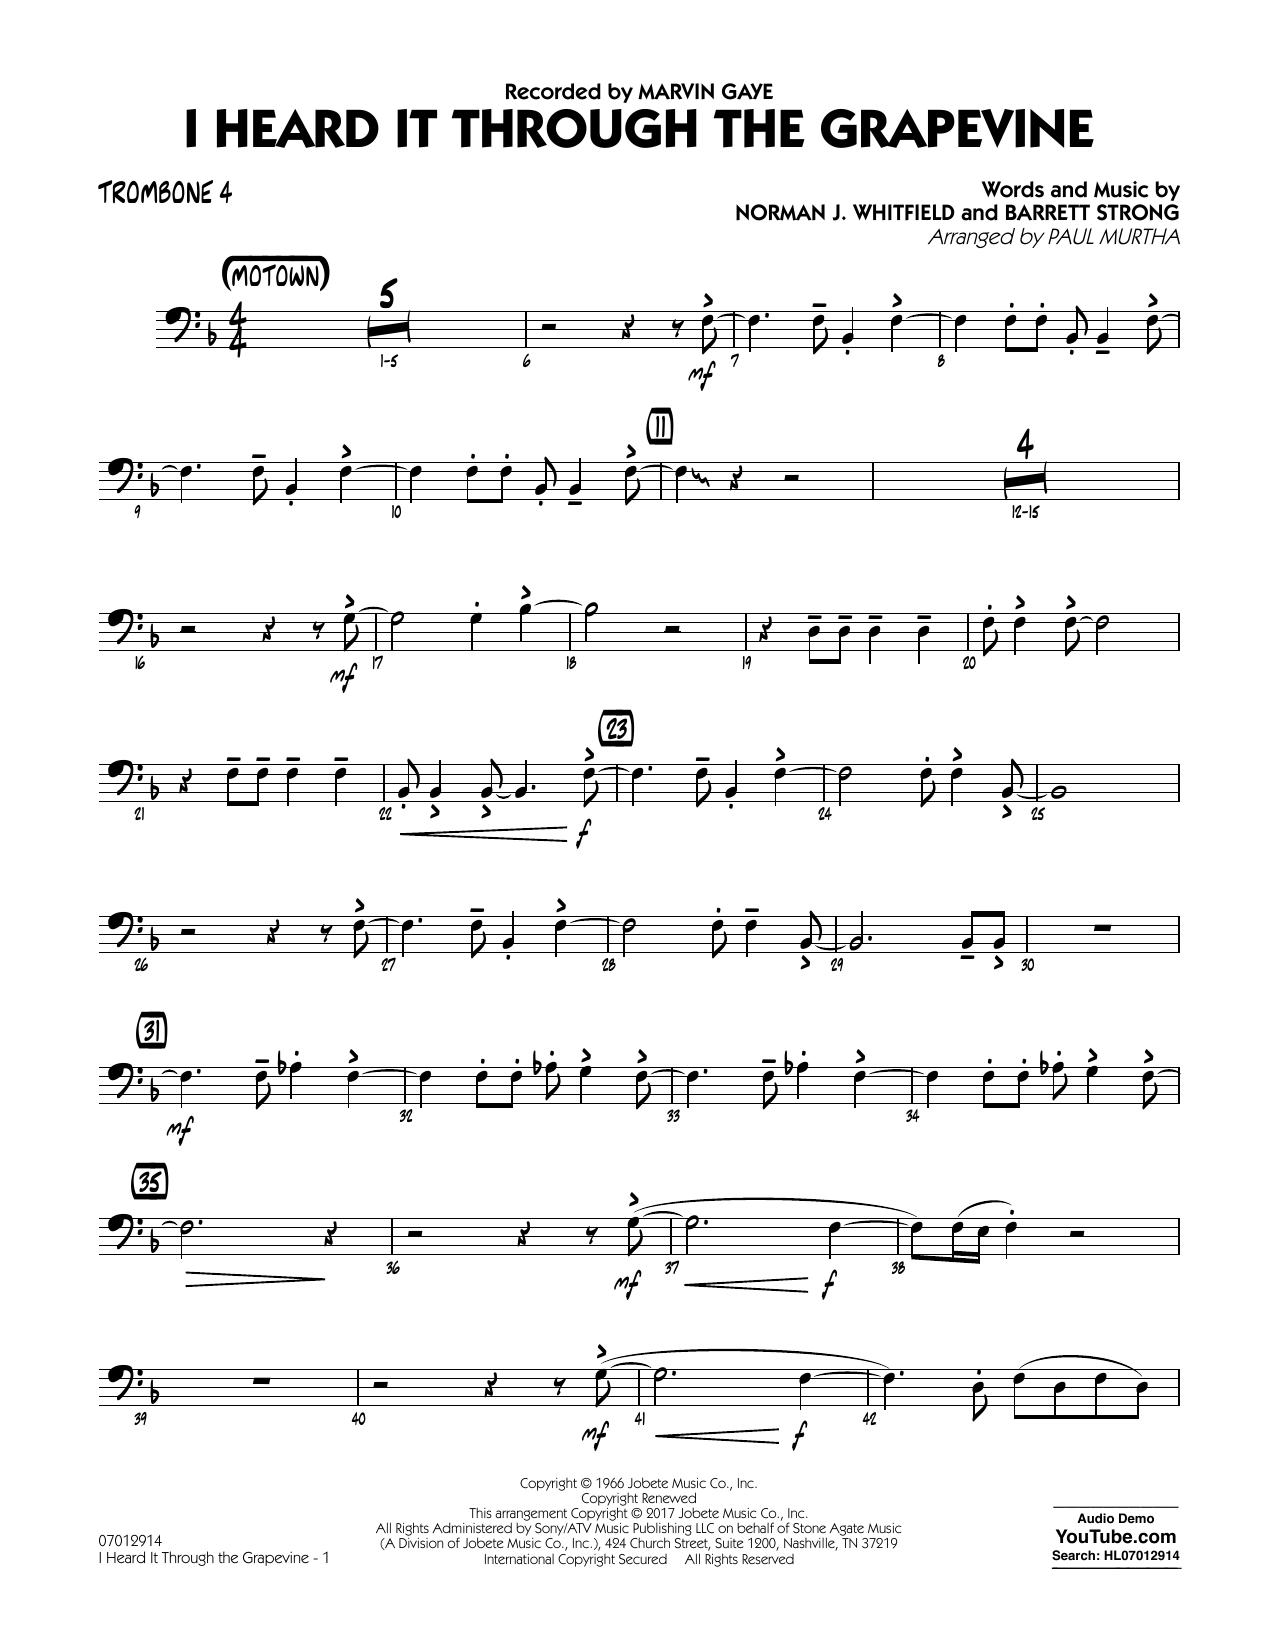 I Heard It Through the Grapevine - Trombone 4 Sheet Music